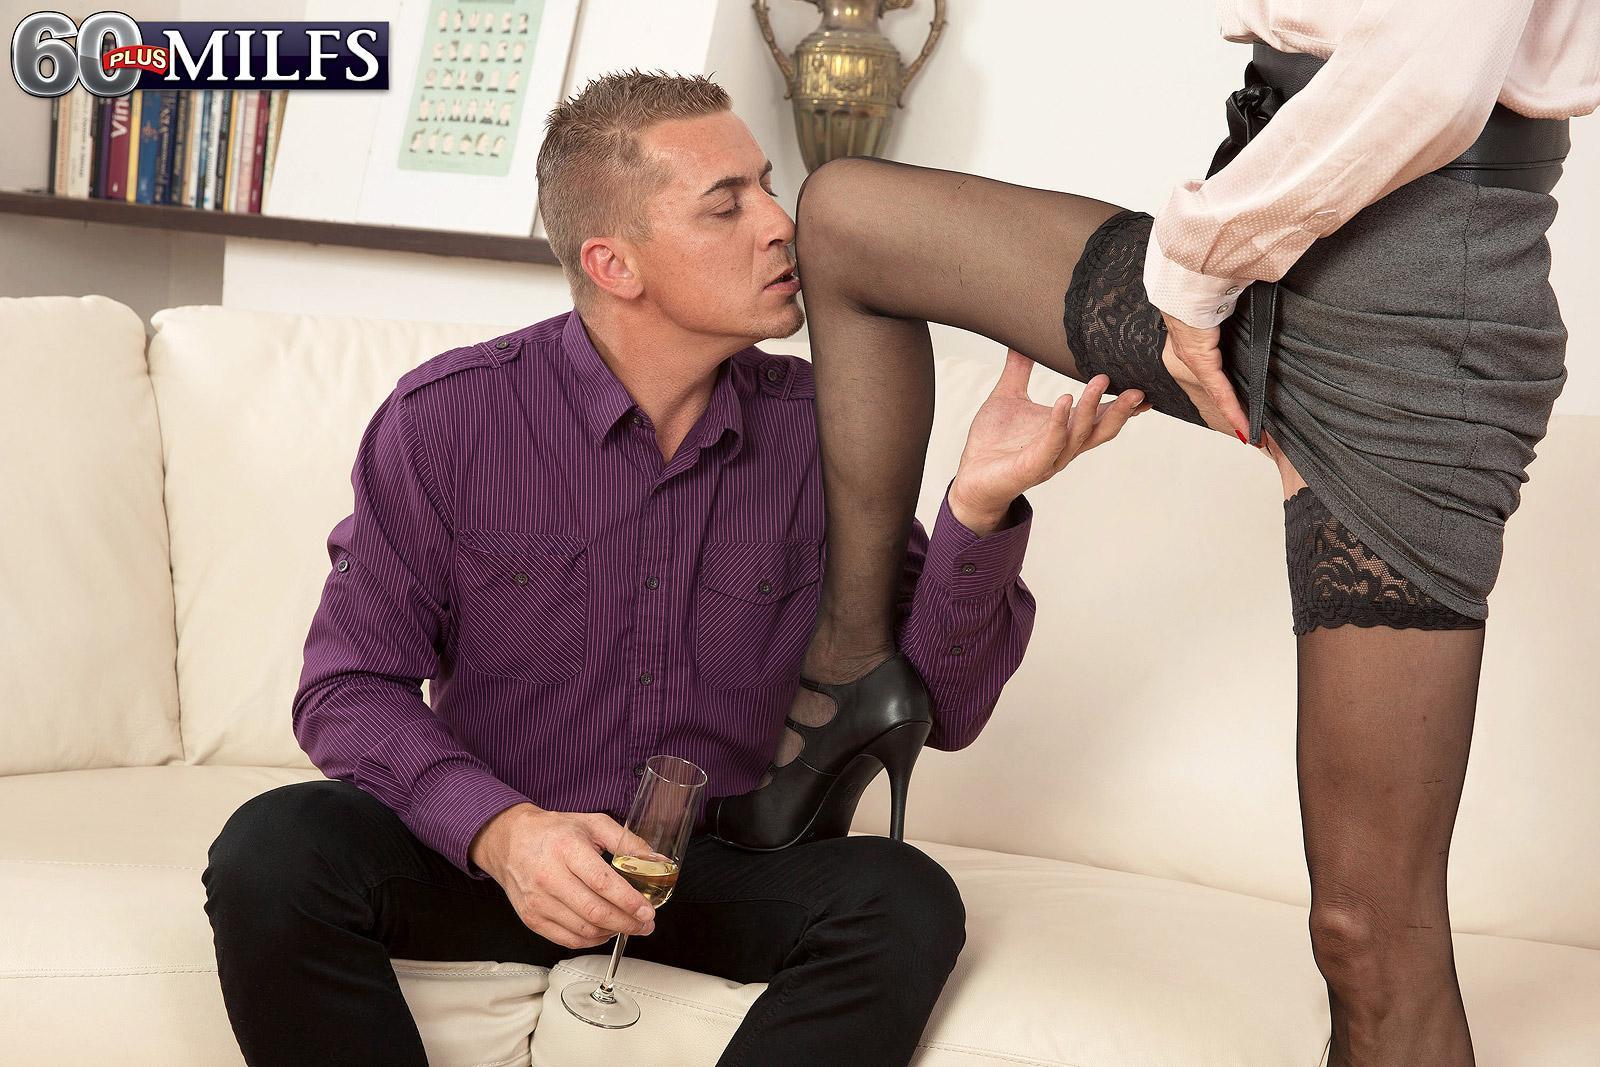 Provocative elder lady Beata gives a ball slurping oral pleasure after seducing a junior guy